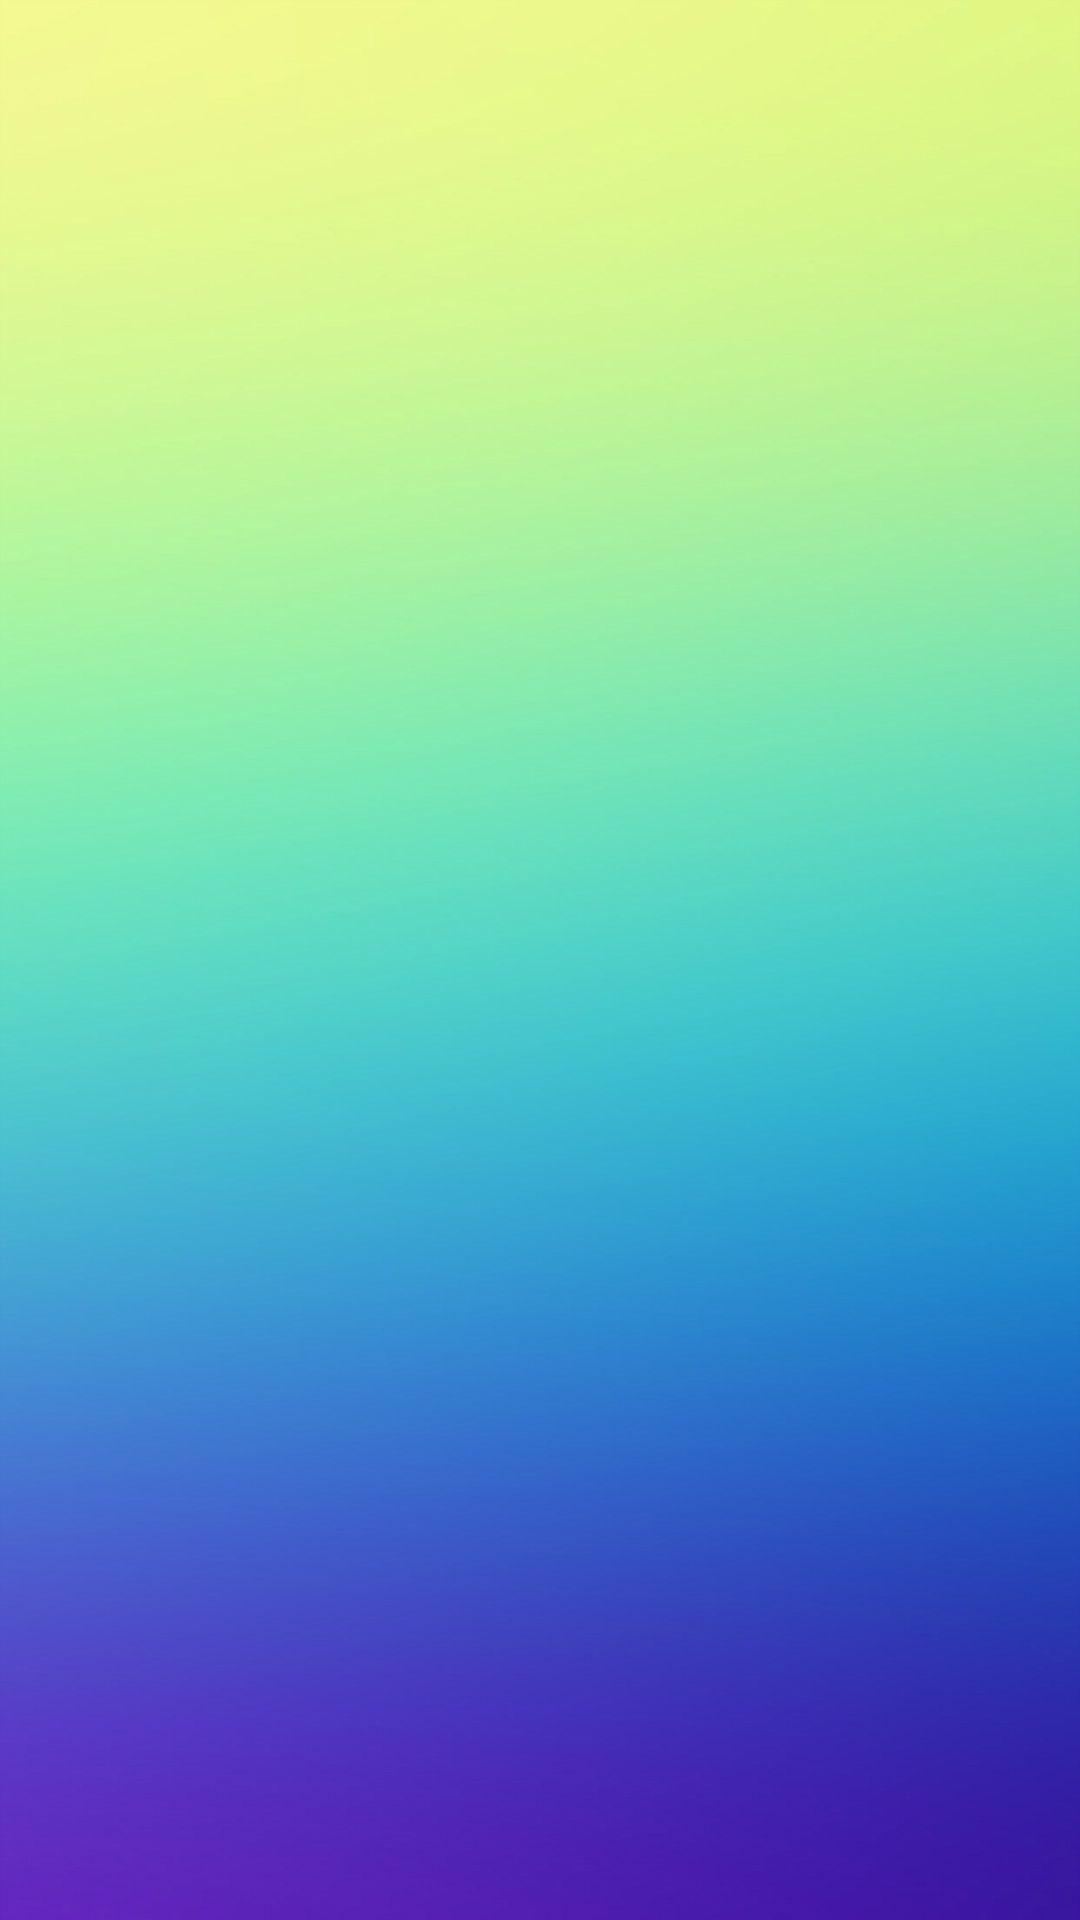 Green Blue Sea Gradation Blur Iphone 8 Wallpapers 색 배경화면 초록